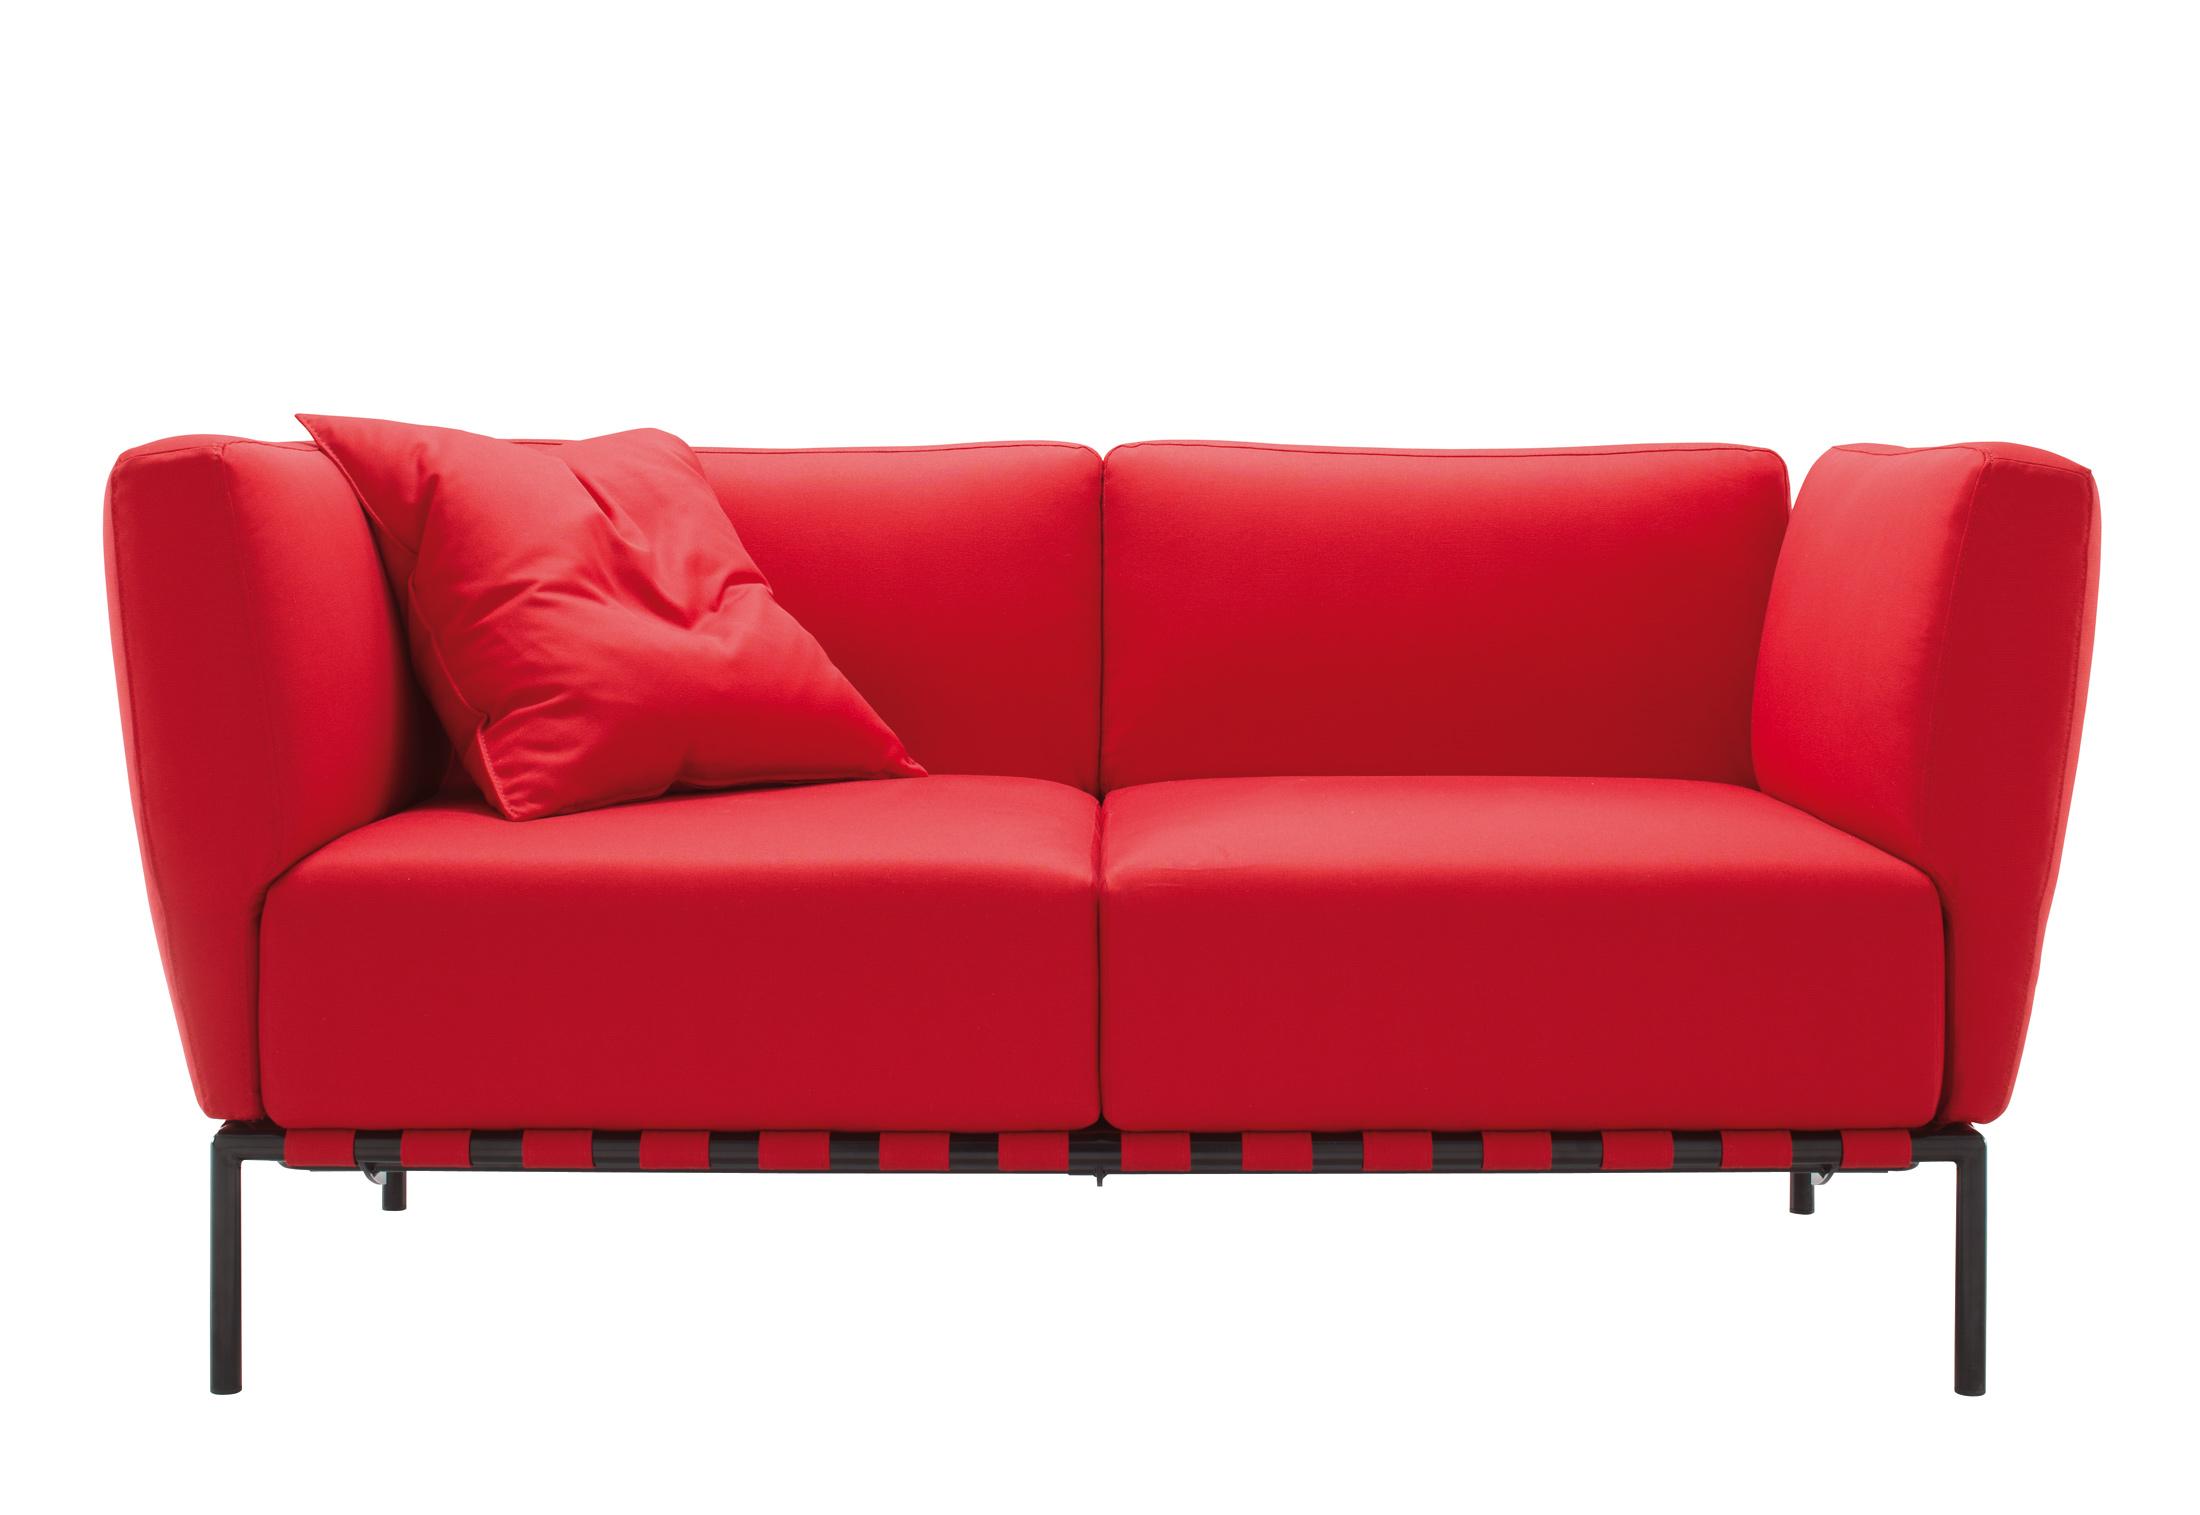 ted 2 seater by ligne roset stylepark. Black Bedroom Furniture Sets. Home Design Ideas